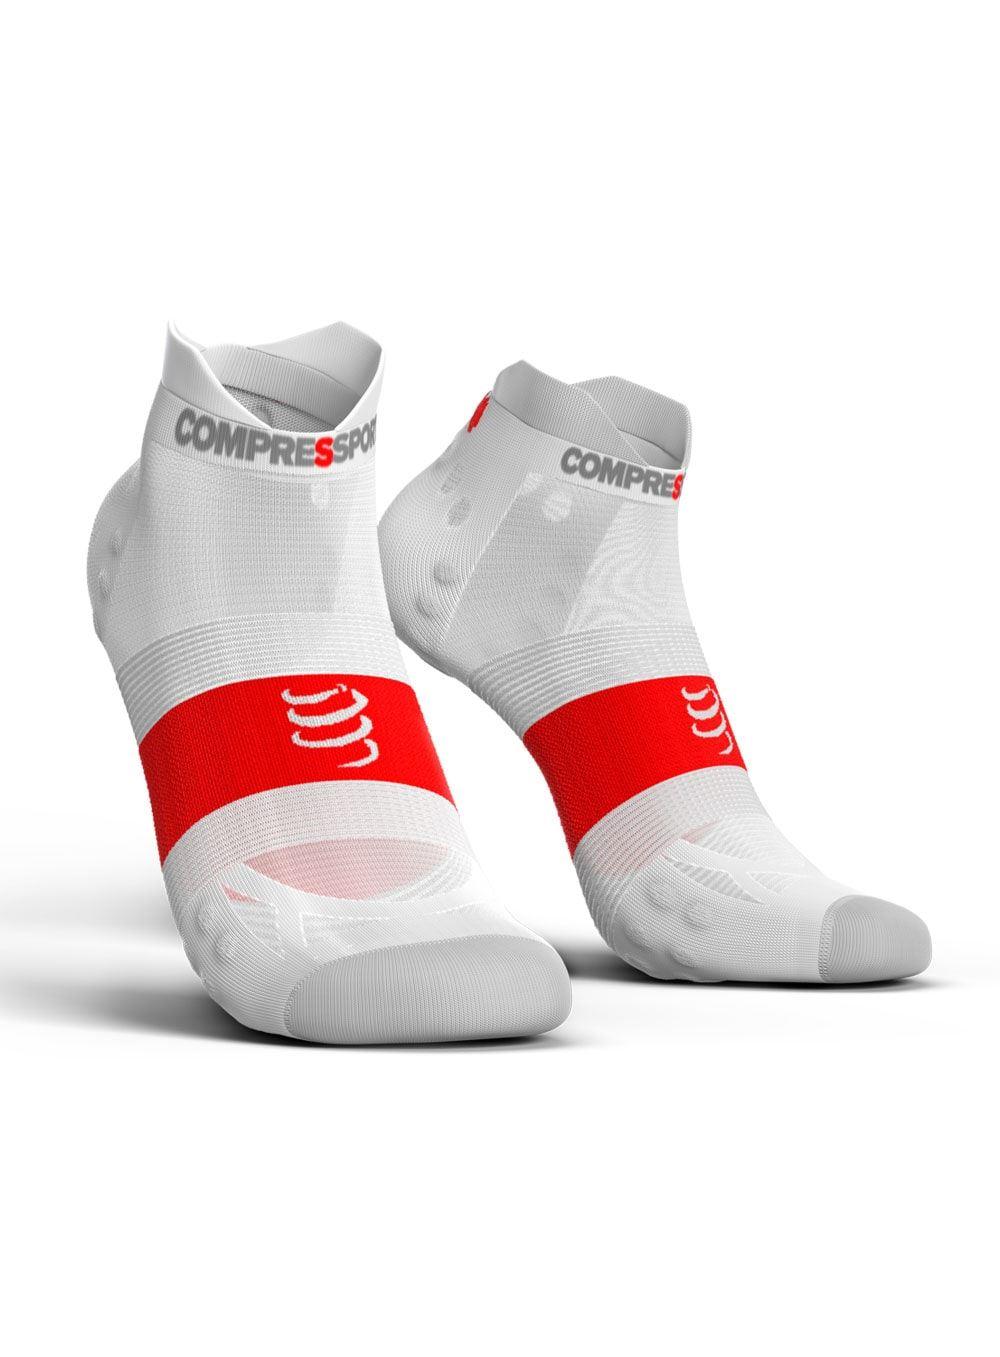 Picture for category Women's Running Socks